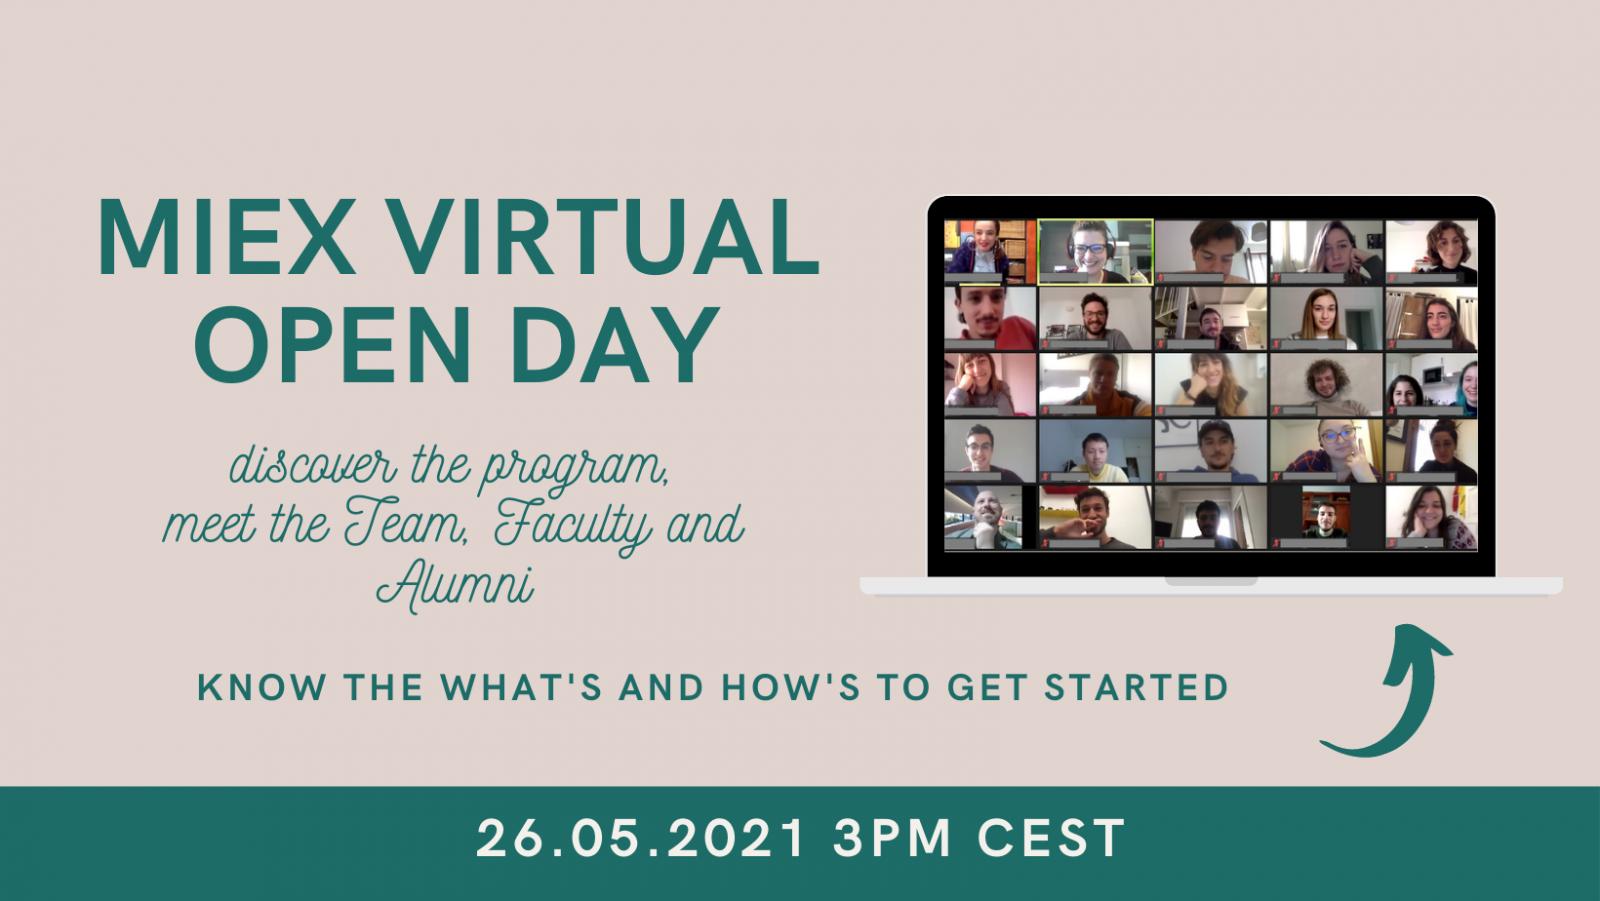 MIEX Virtual Open Day, May 26th 2021